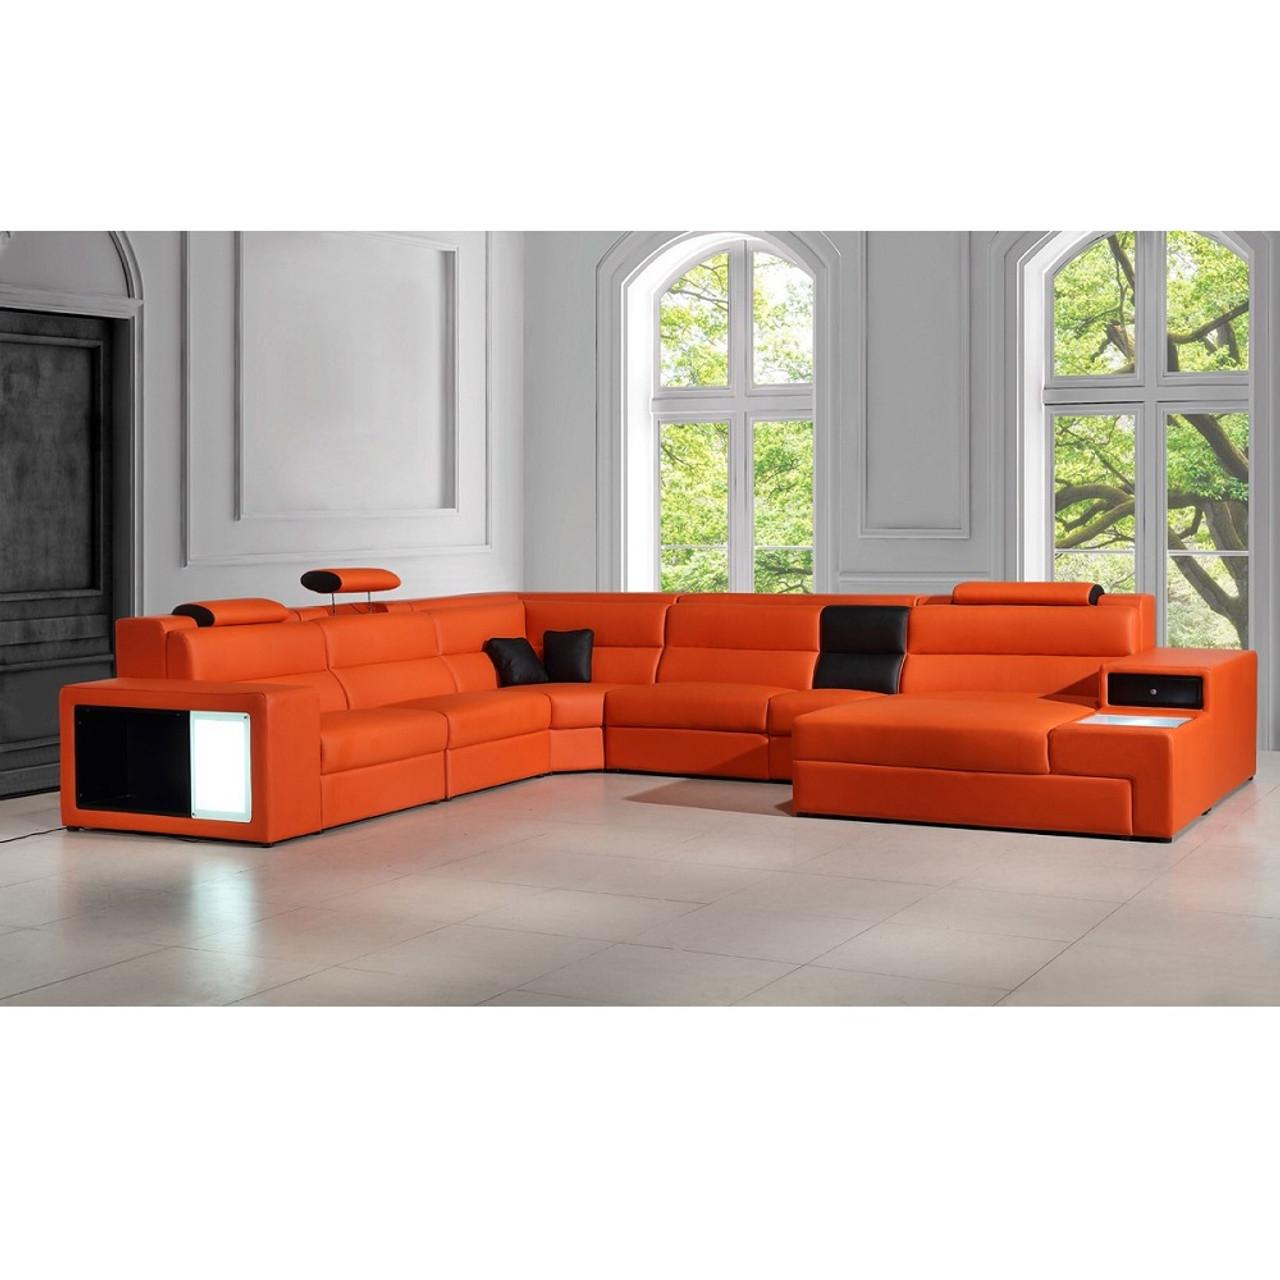 Wondrous Divani Casa Polaris Orange Contemporary Bonded Leather Sectional Sofa Machost Co Dining Chair Design Ideas Machostcouk